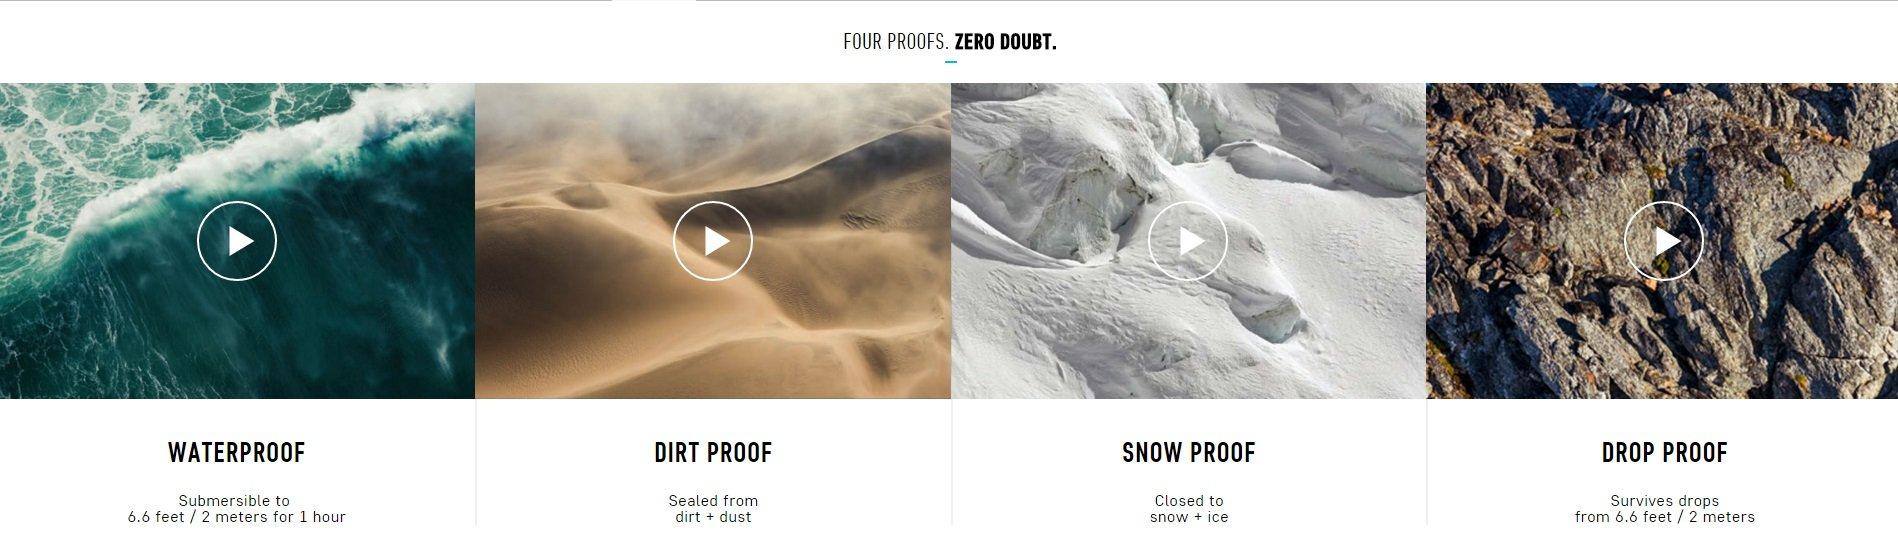 4 prove lifeproof